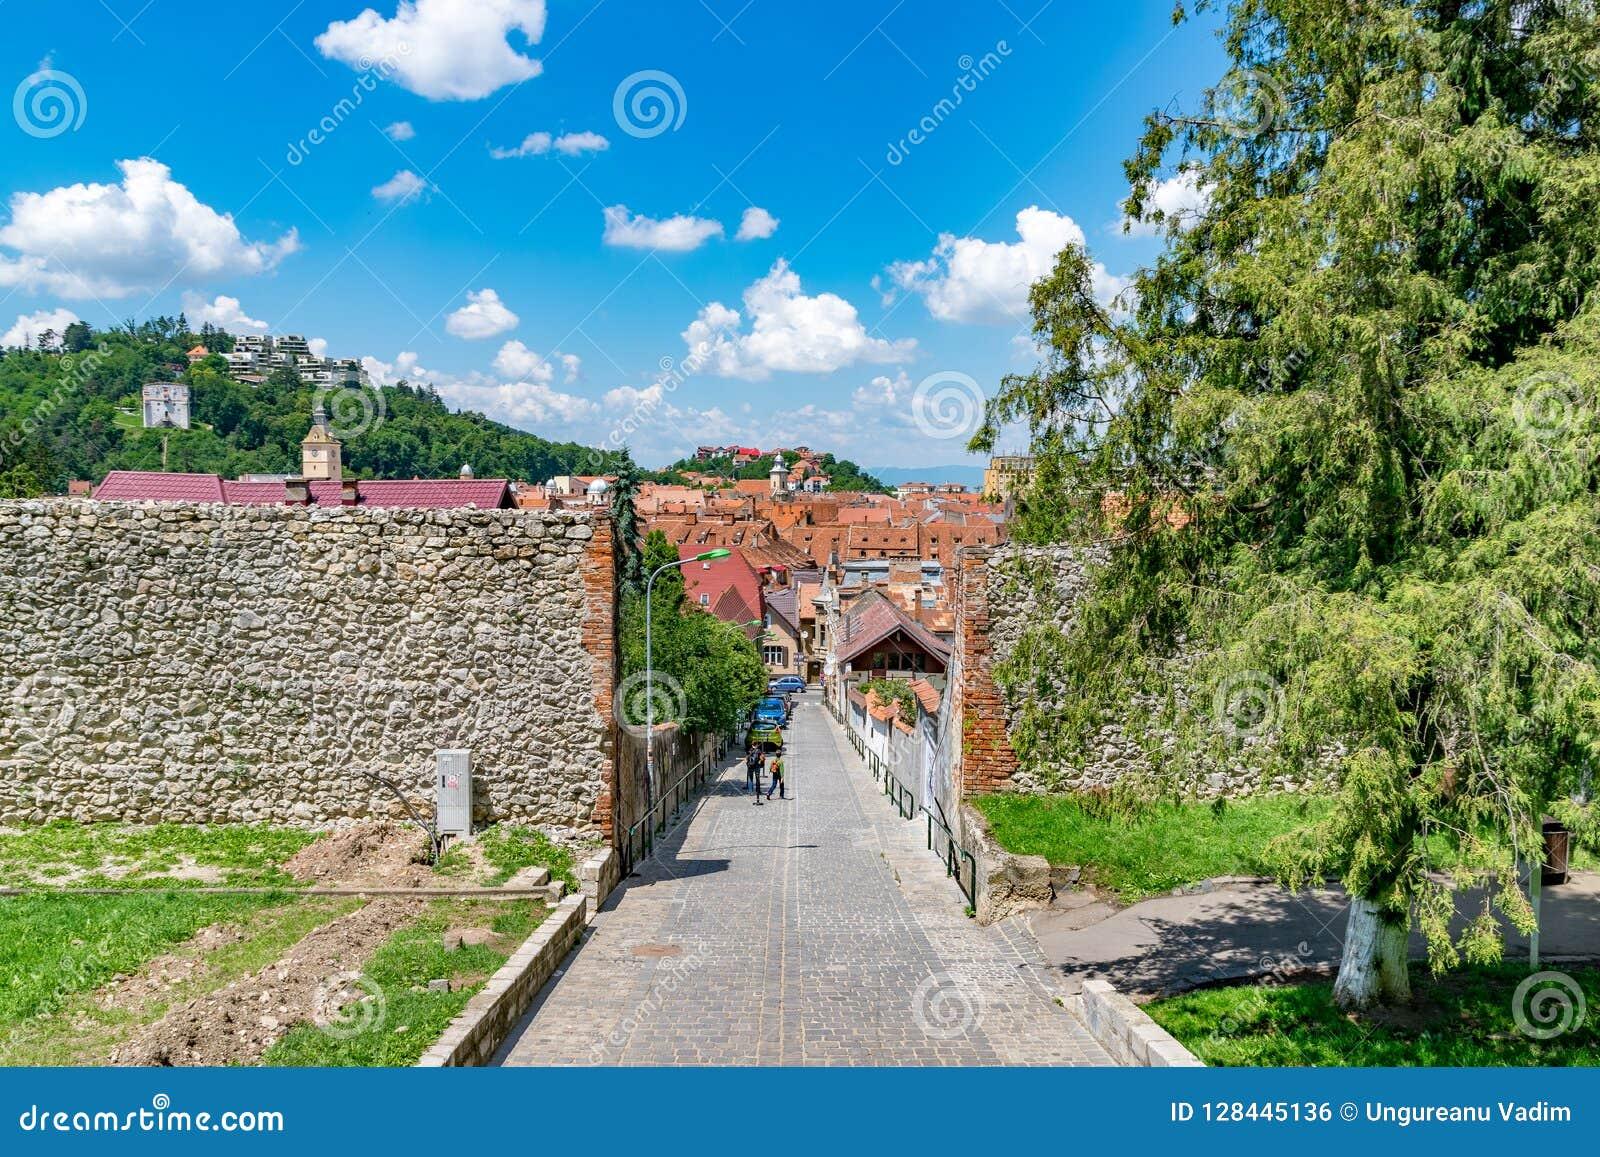 BRASOV, ROMANIA - 19 JUNE, 2018: Beautiful street in Brasov, Romania